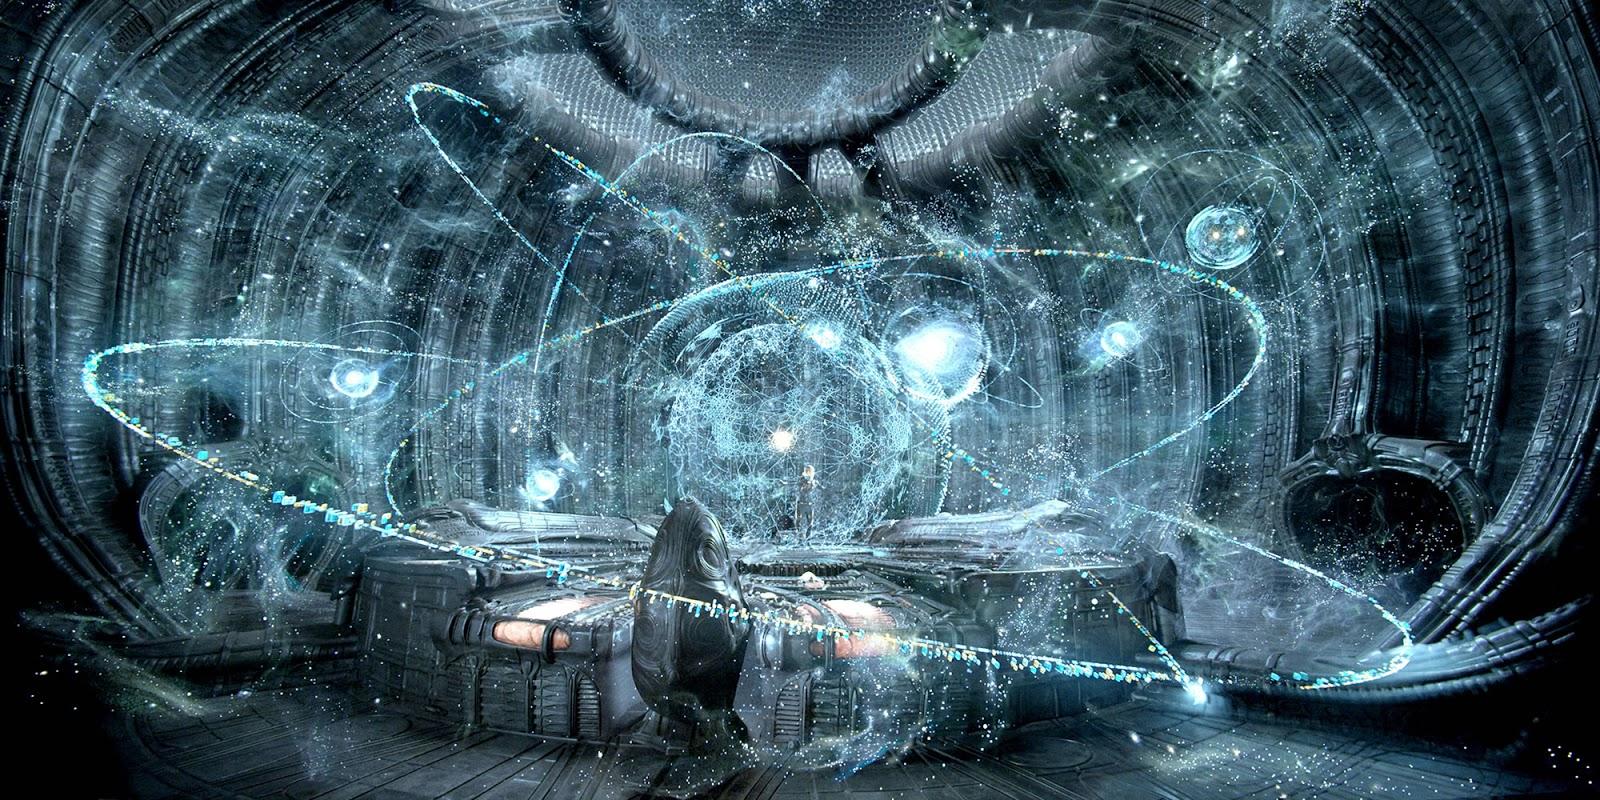 http://2.bp.blogspot.com/-kCnqHiEWKzQ/UKZMorYWAKI/AAAAAAAADlE/rstZ7vxRnEA/s1600/prometheus-hologram-movie-ridley-scott-alien-science-fiction-2012.jpg